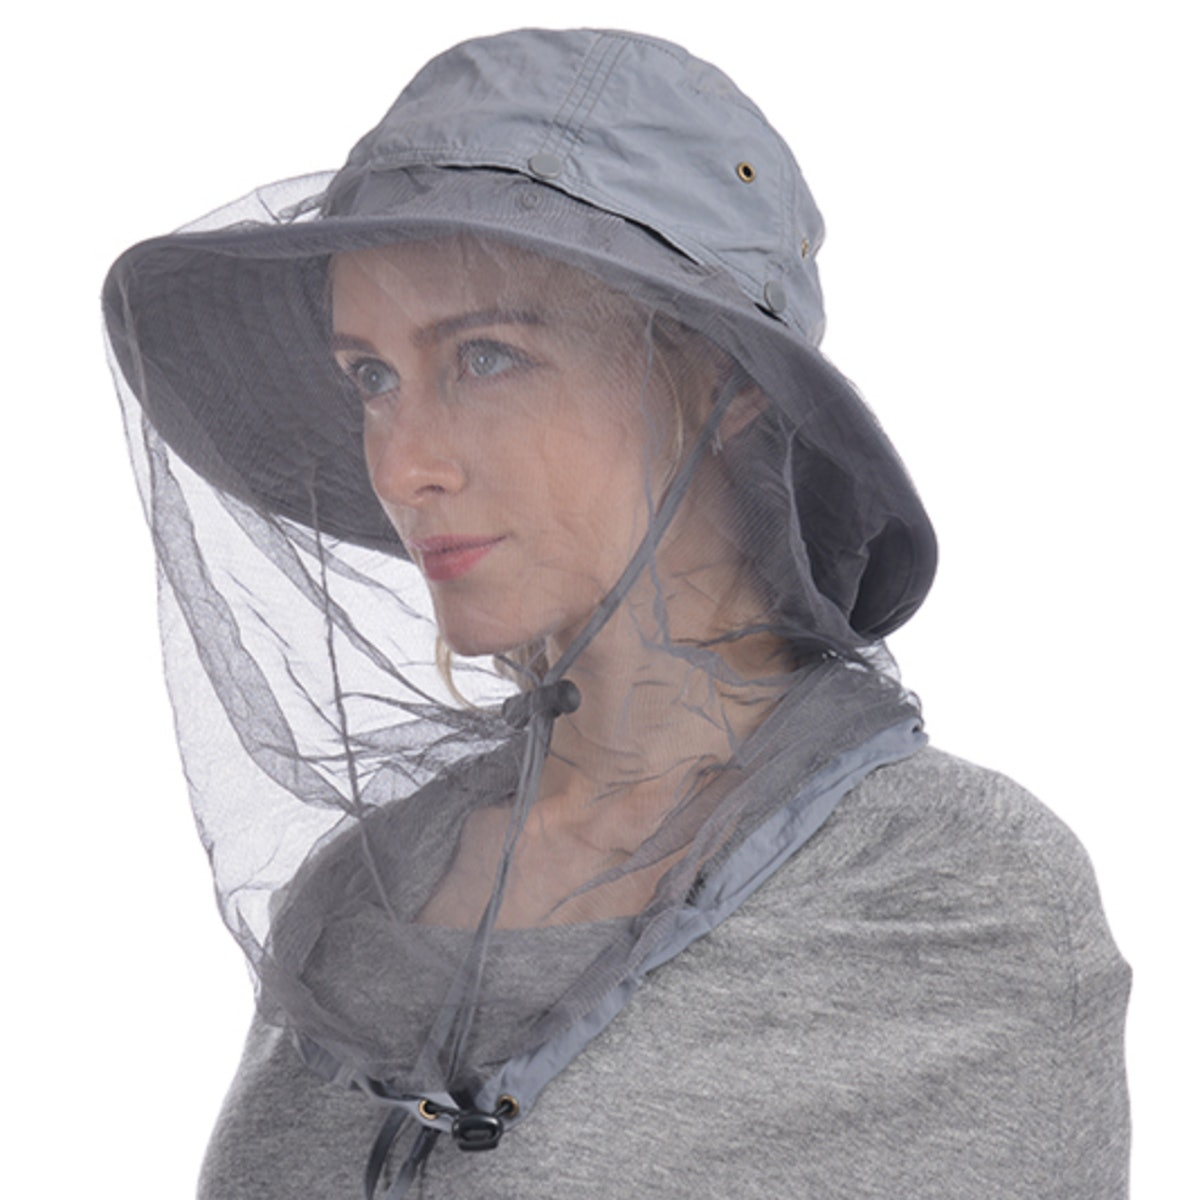 Ushake Sun Hat with Hidden Net